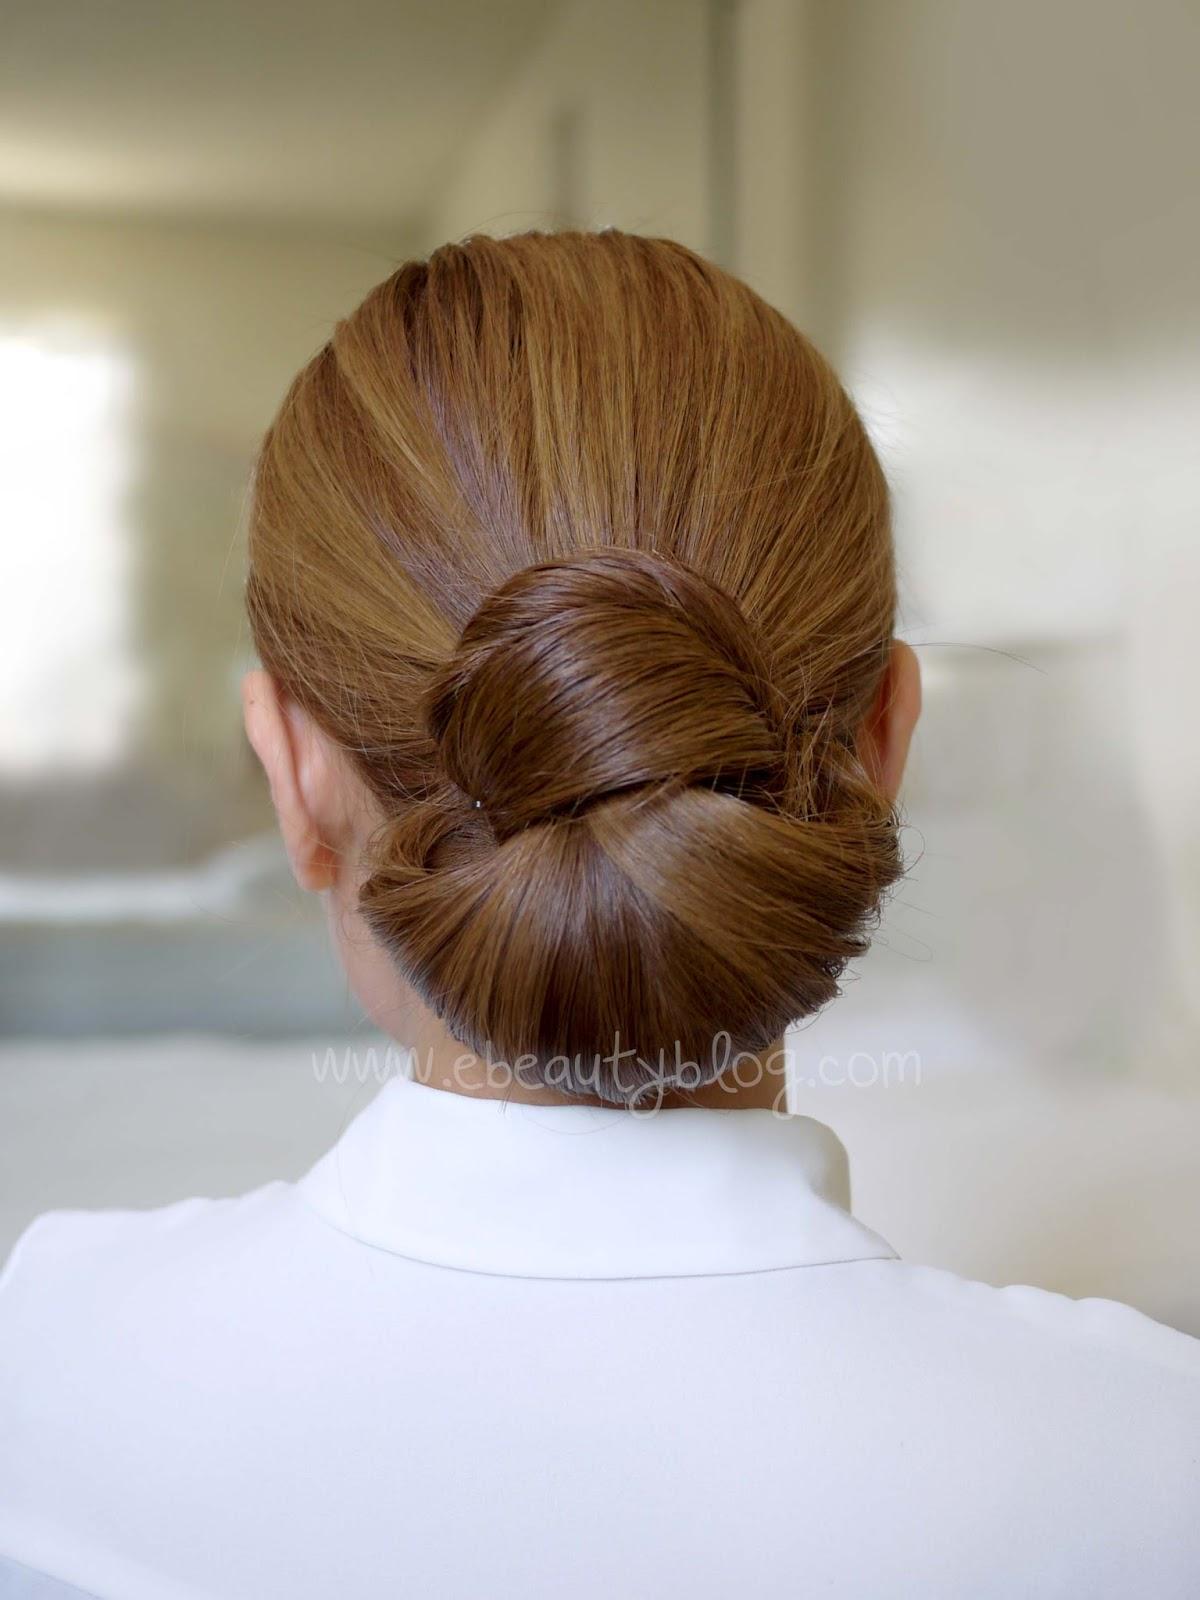 Tremendous Ebeautyblog Com Hair Tutorial Easy Elegance Hair Bun Hairstyle Inspiration Daily Dogsangcom